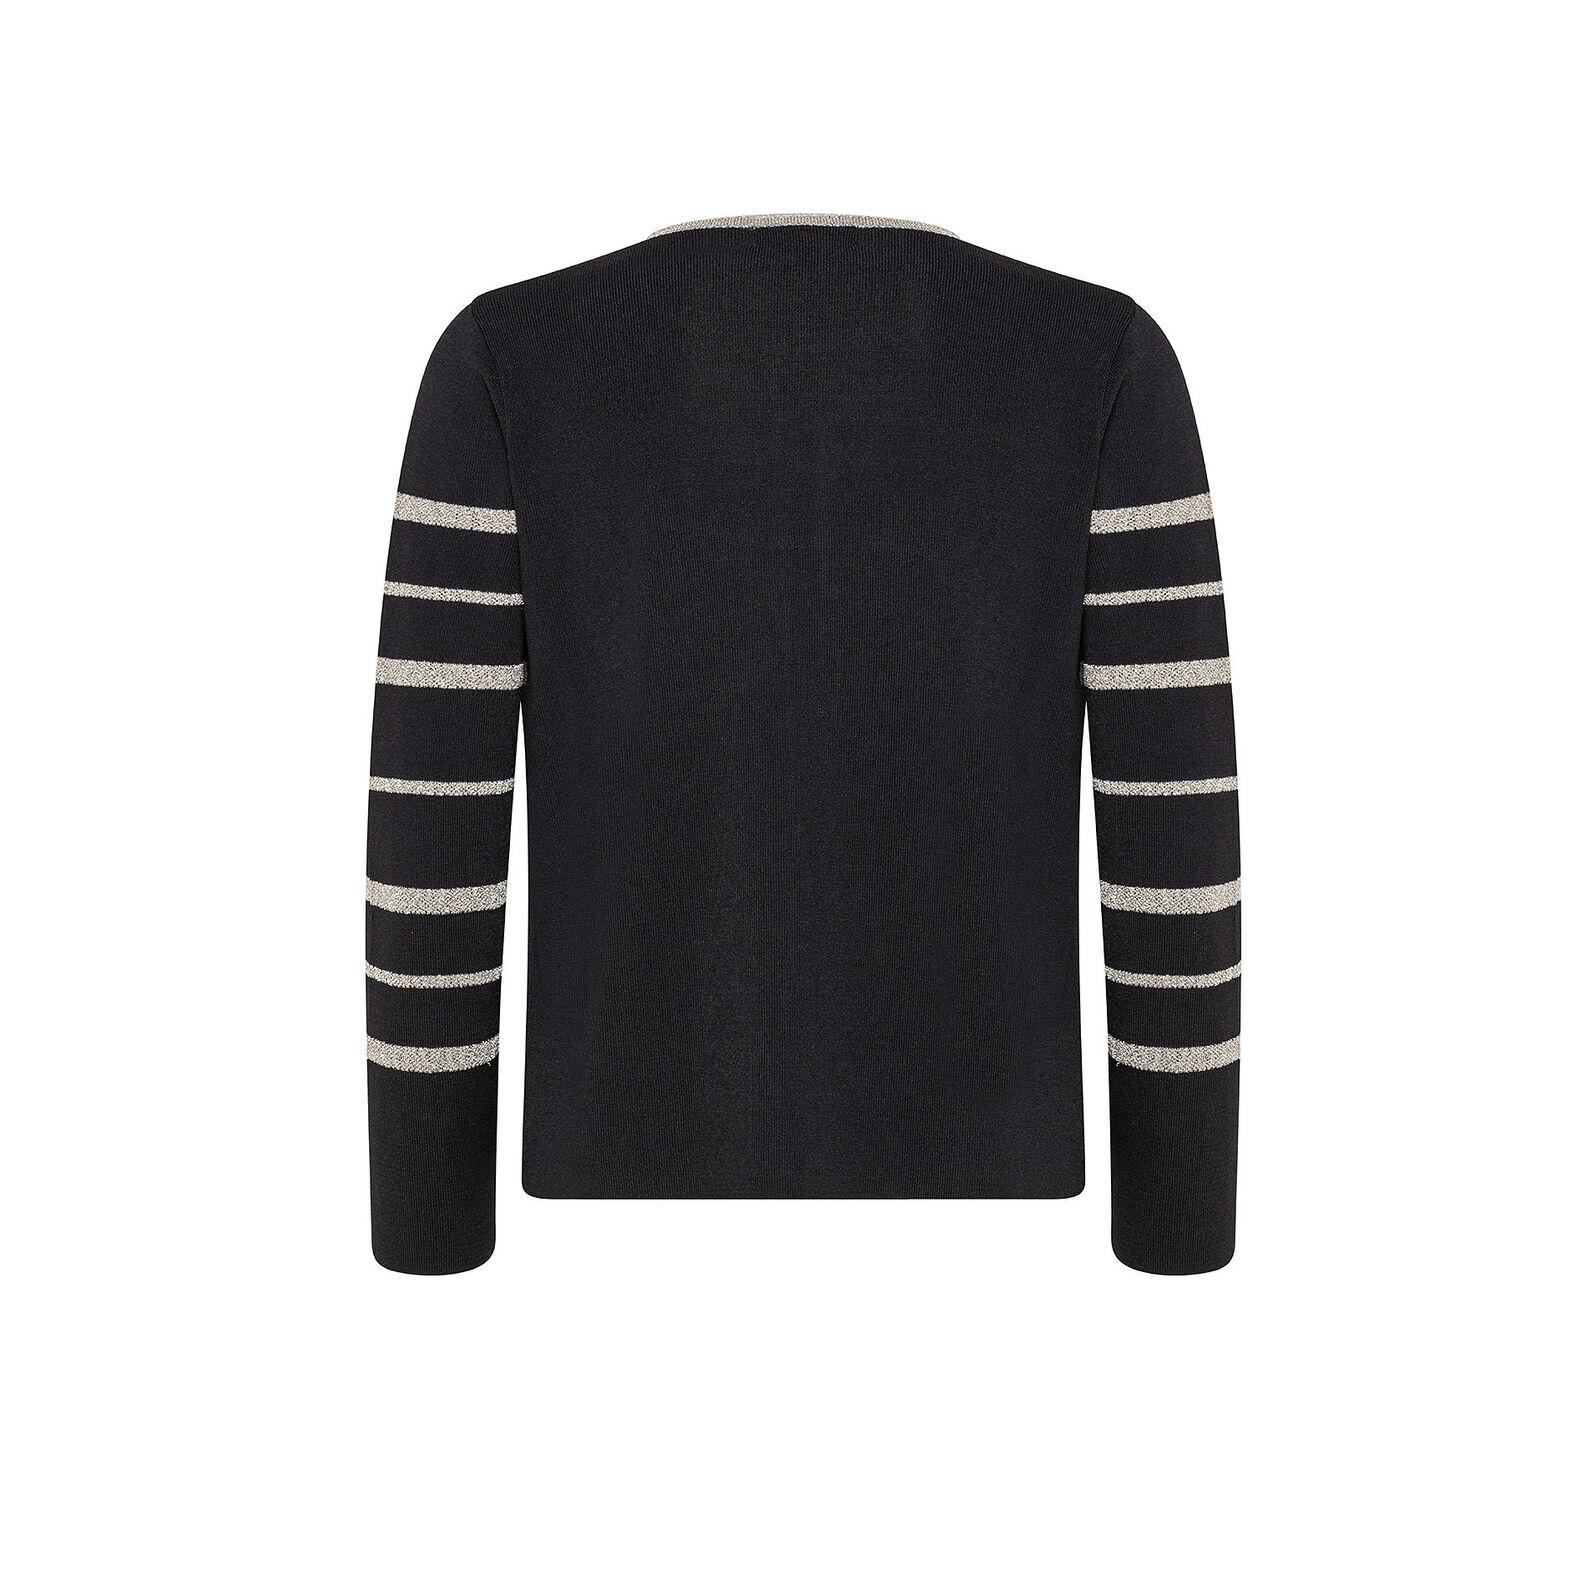 Lurex striped crewneck cardigan